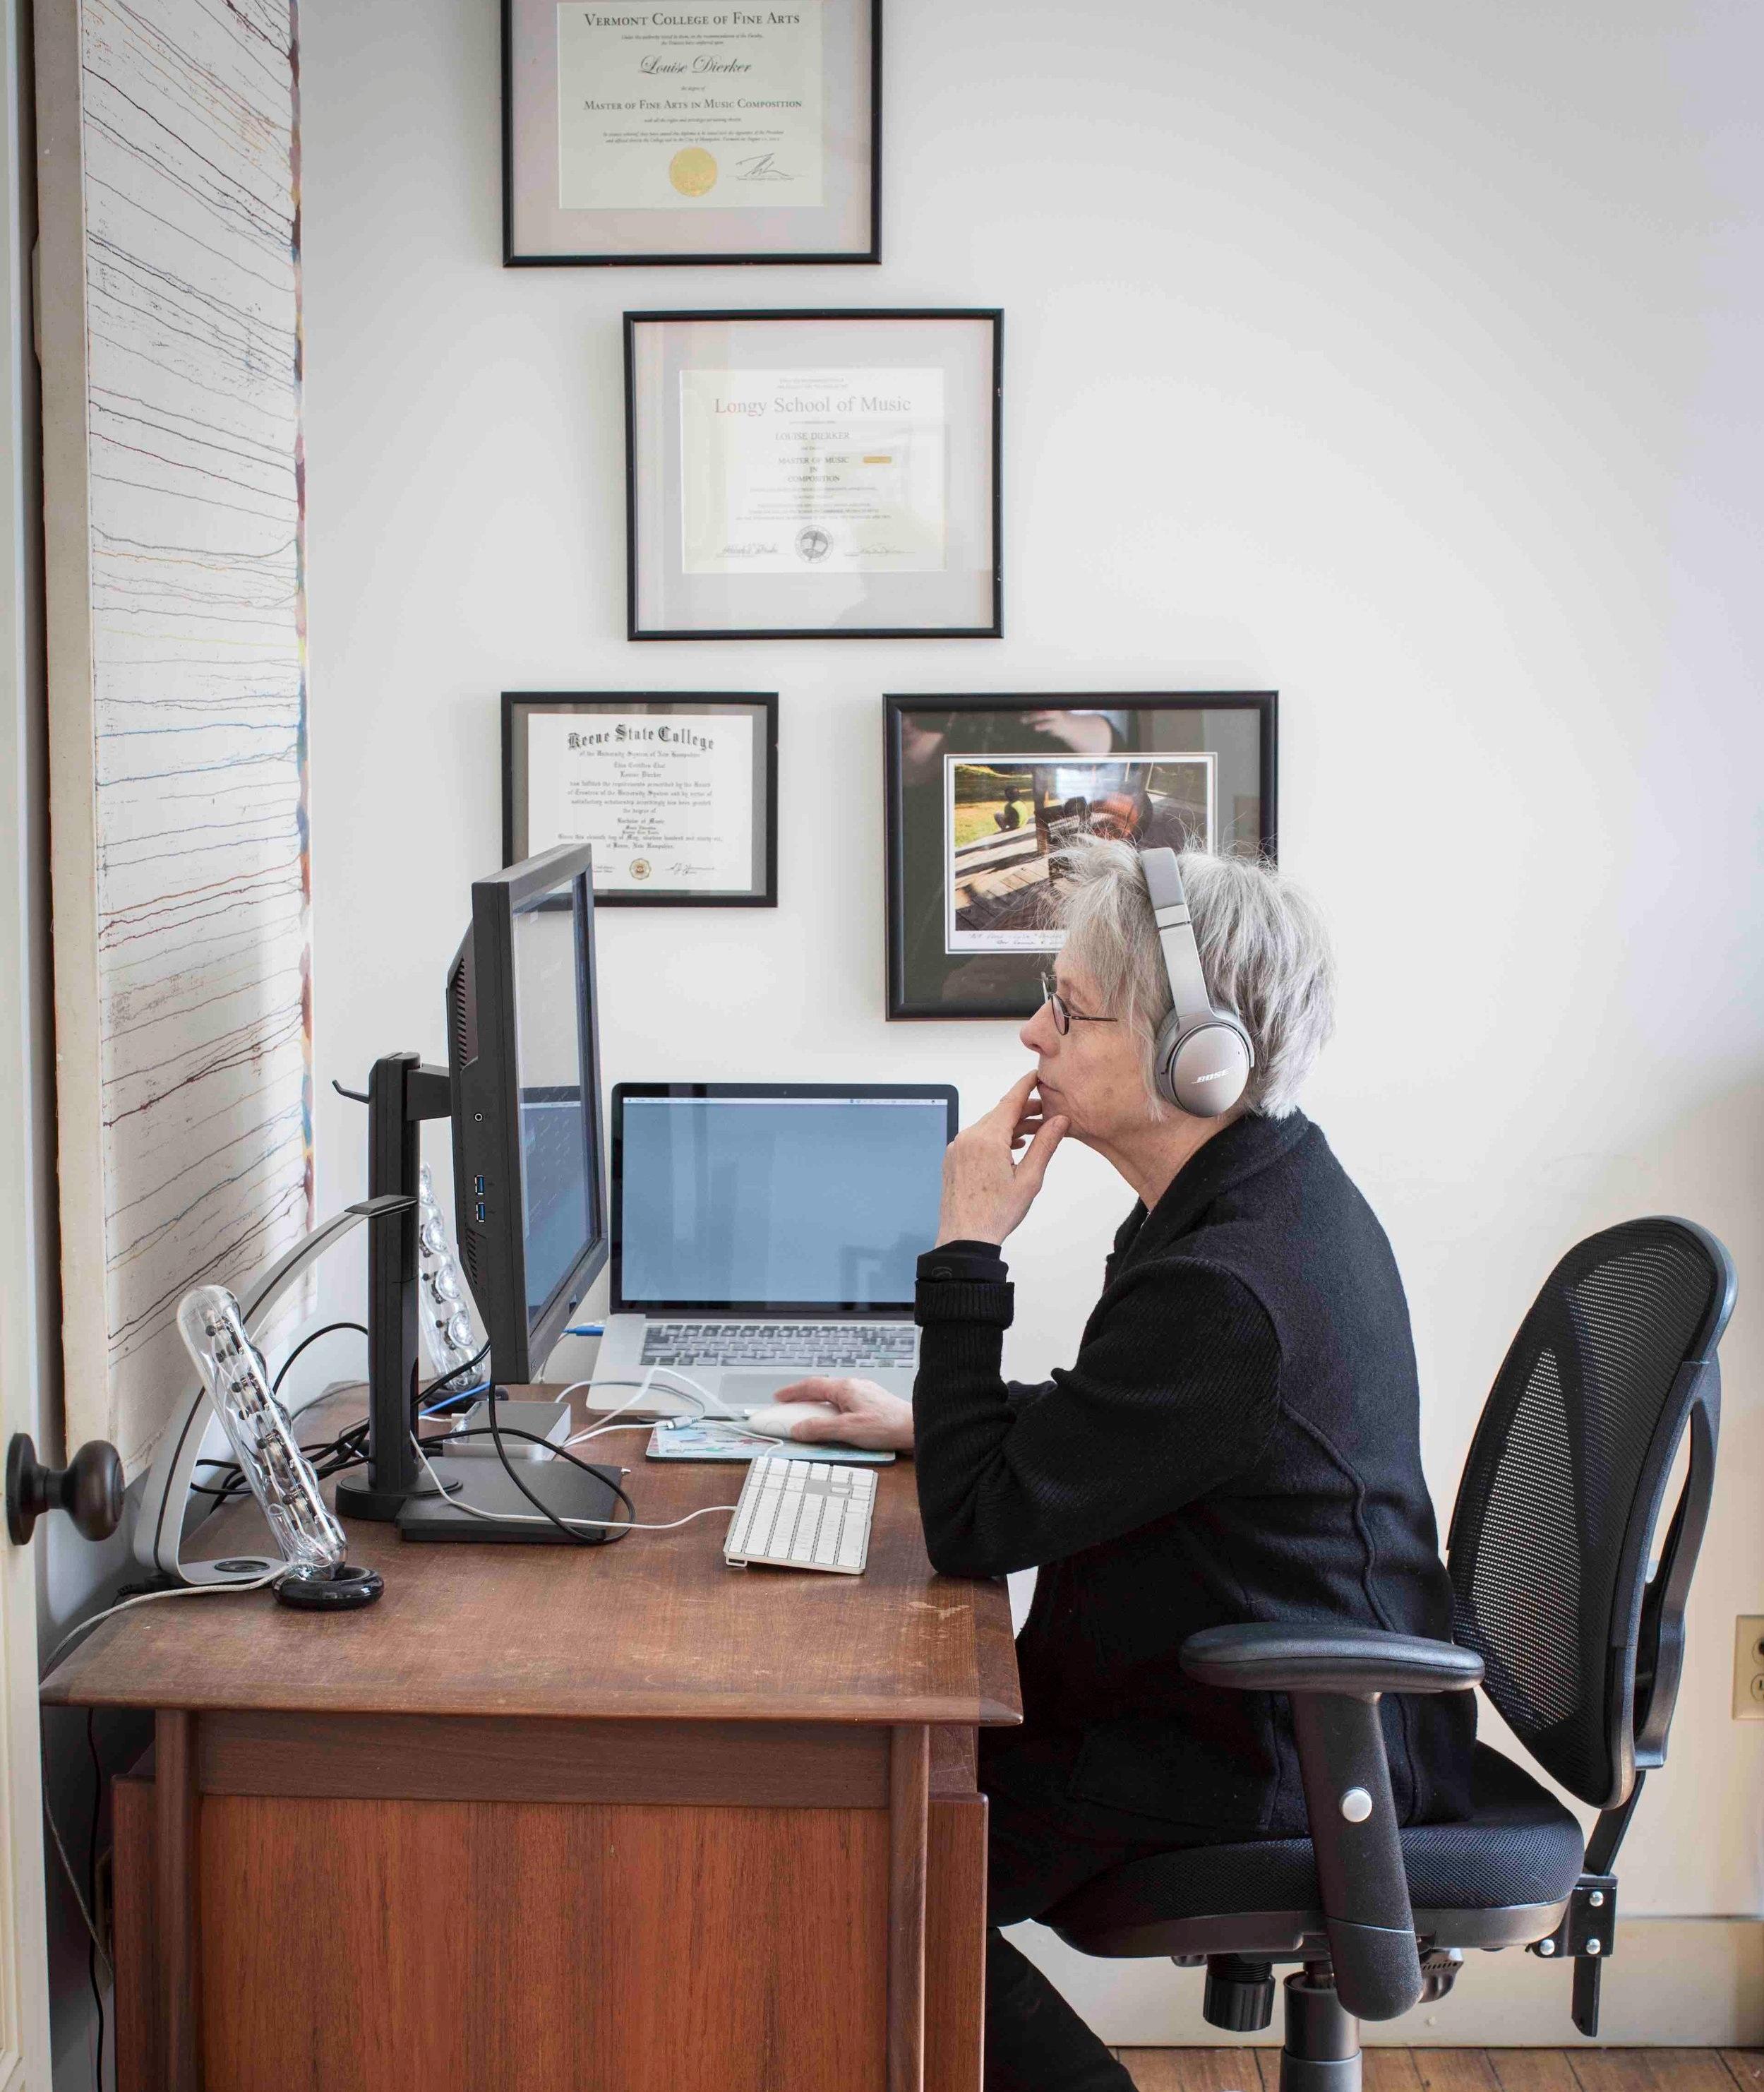 L.A. Dierker in her Harrisville studio (Photo by  Lori Pedrick )